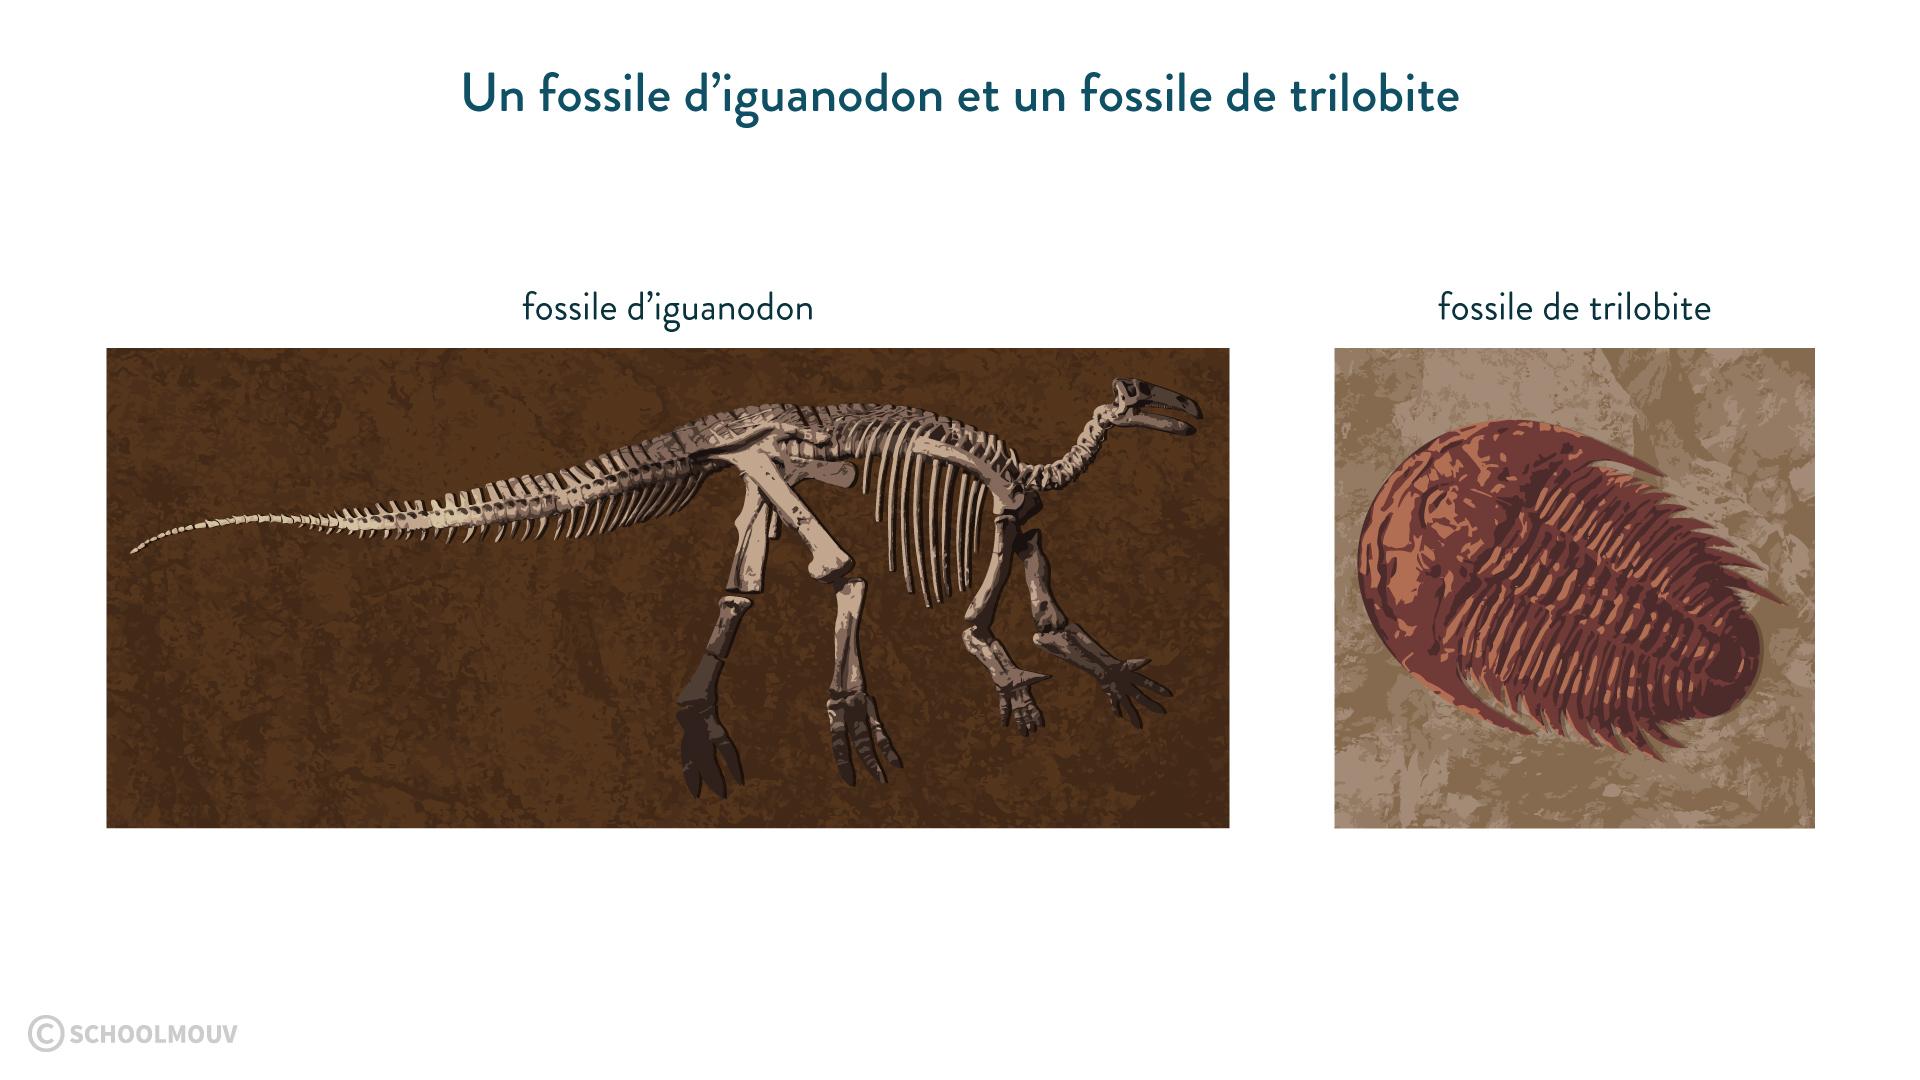 Un fossile d'iguanodon et un fossile de trilobite-svt-6eme-schoolmouv